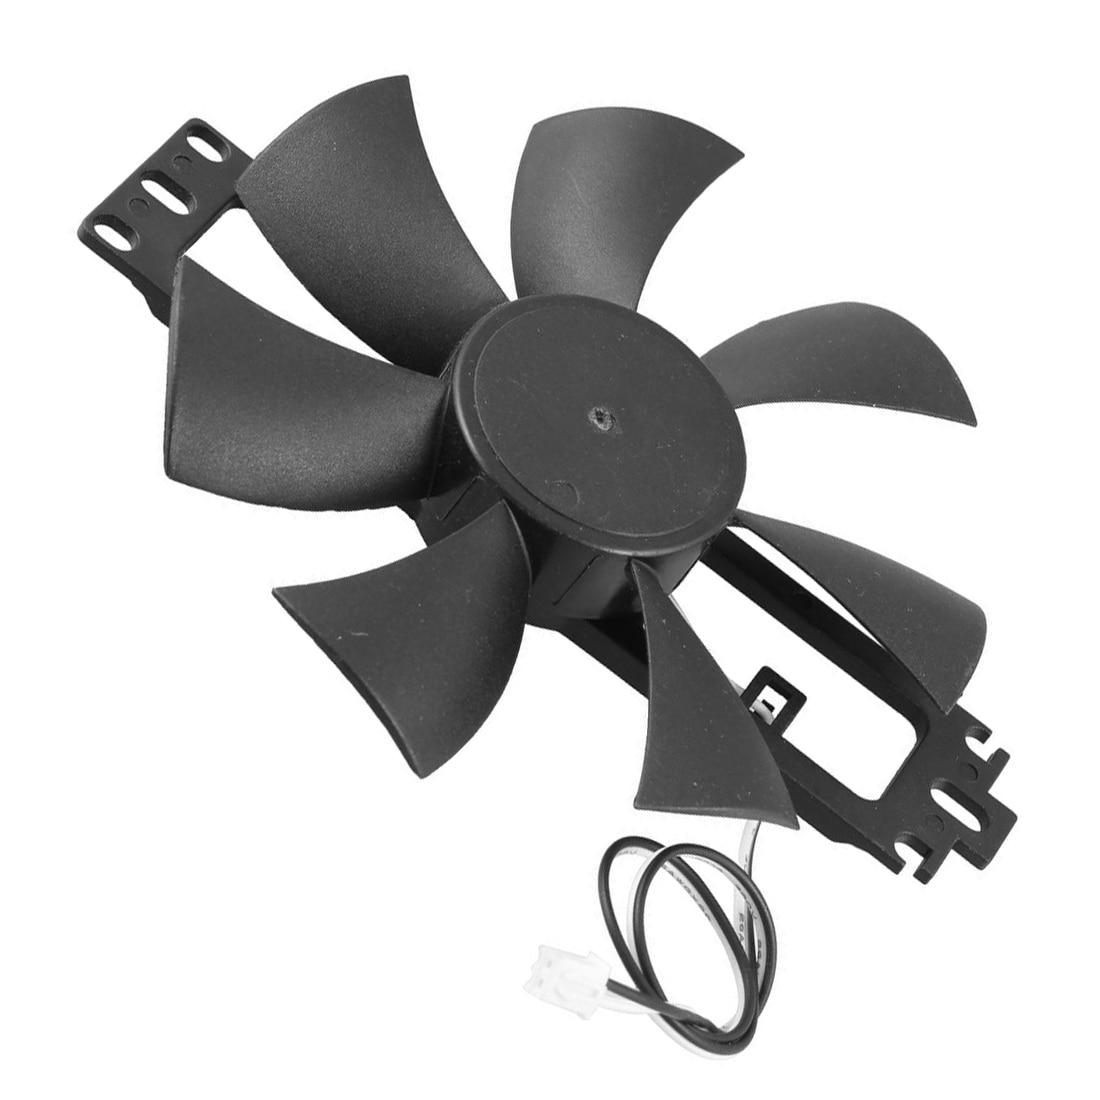 DC 18V Plastic Induction Cooker Brushless Cooling Fan drop ShippingDC 18V Plastic Induction Cooker Brushless Cooling Fan drop Shipping